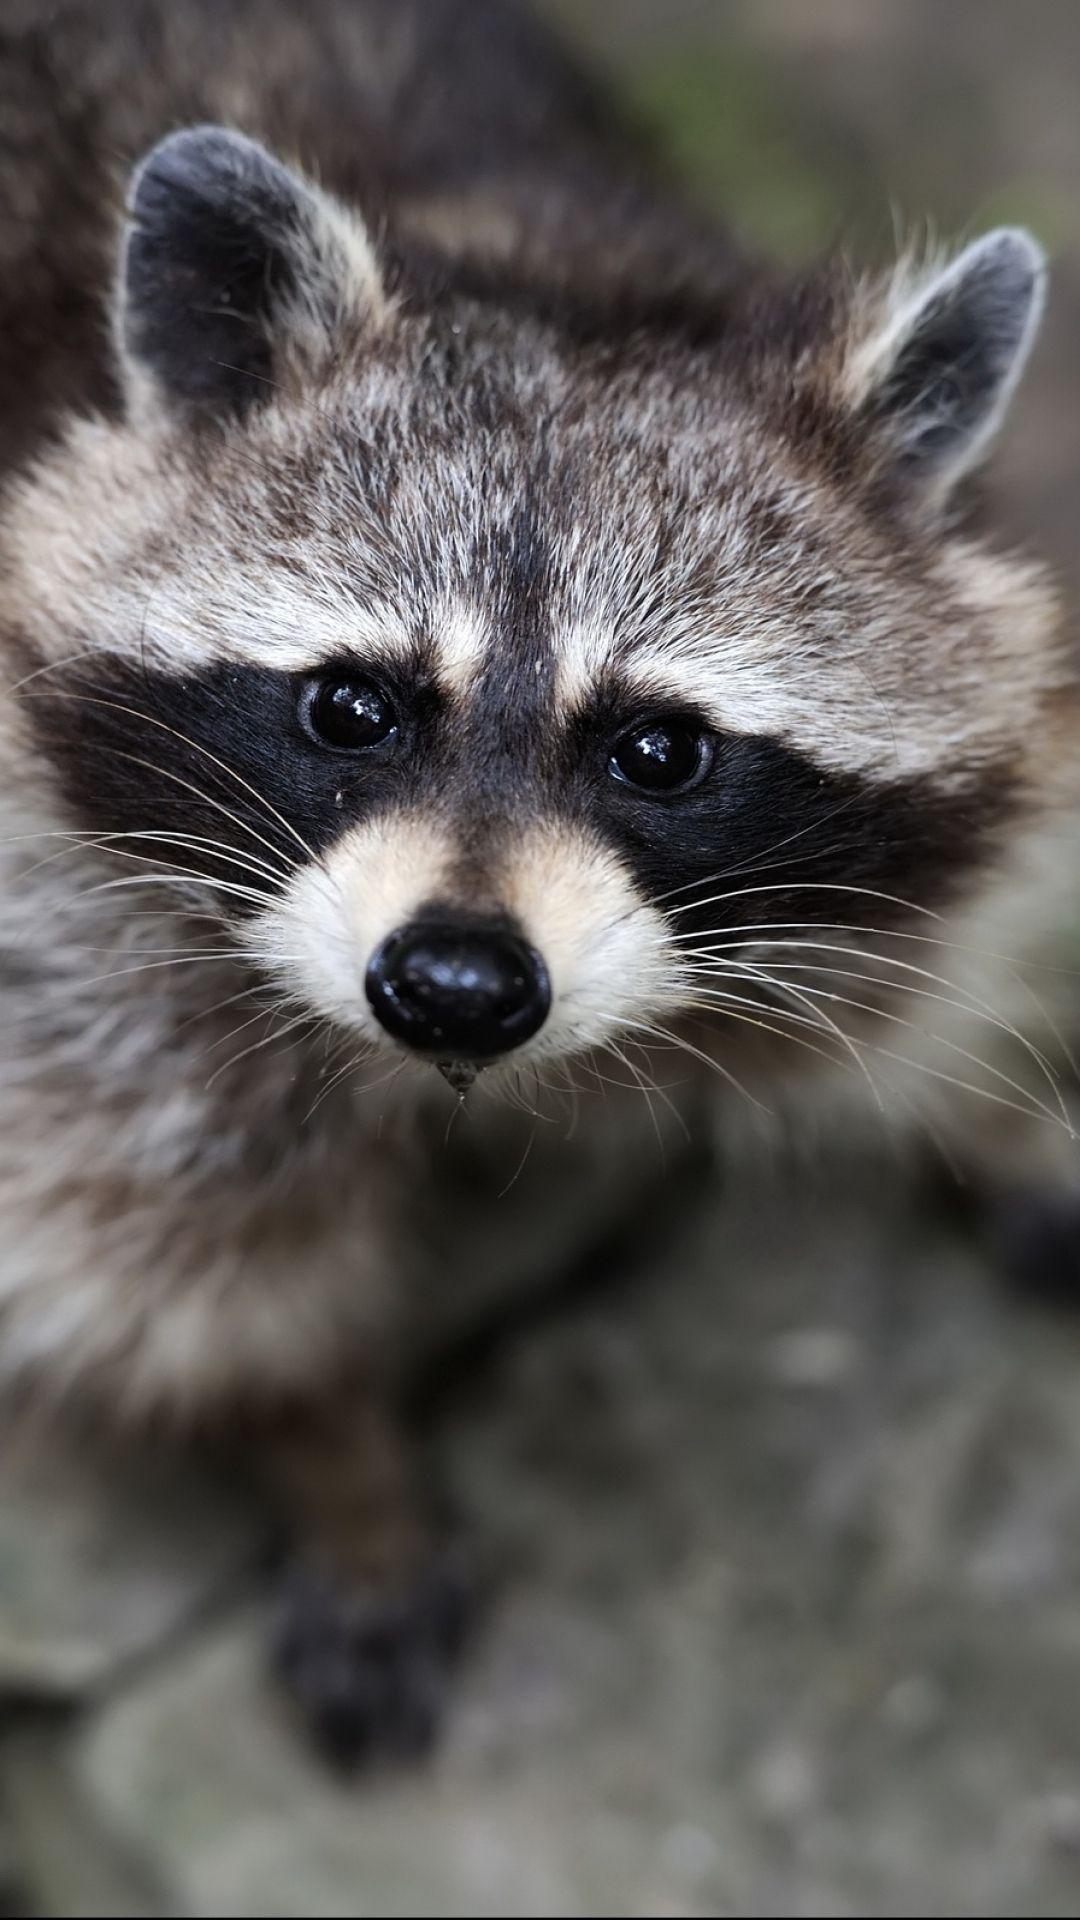 Iphone 6 Plus Animal Raccoon Wallpaper Id 392014 Rare Animals Animals Pet Birds